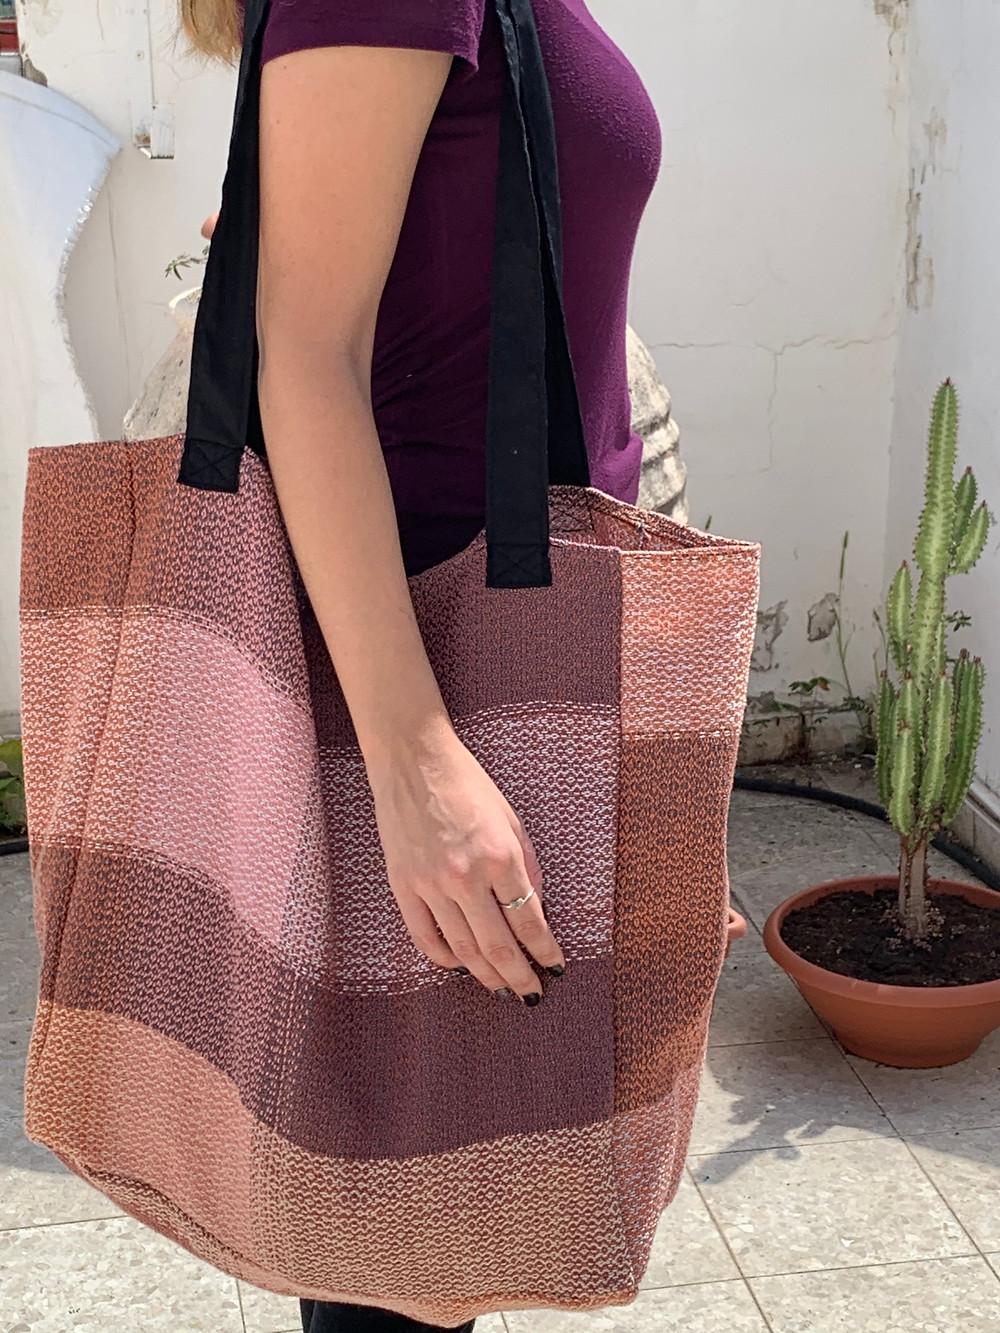 Greyscale & Muted XL Shopping Bag